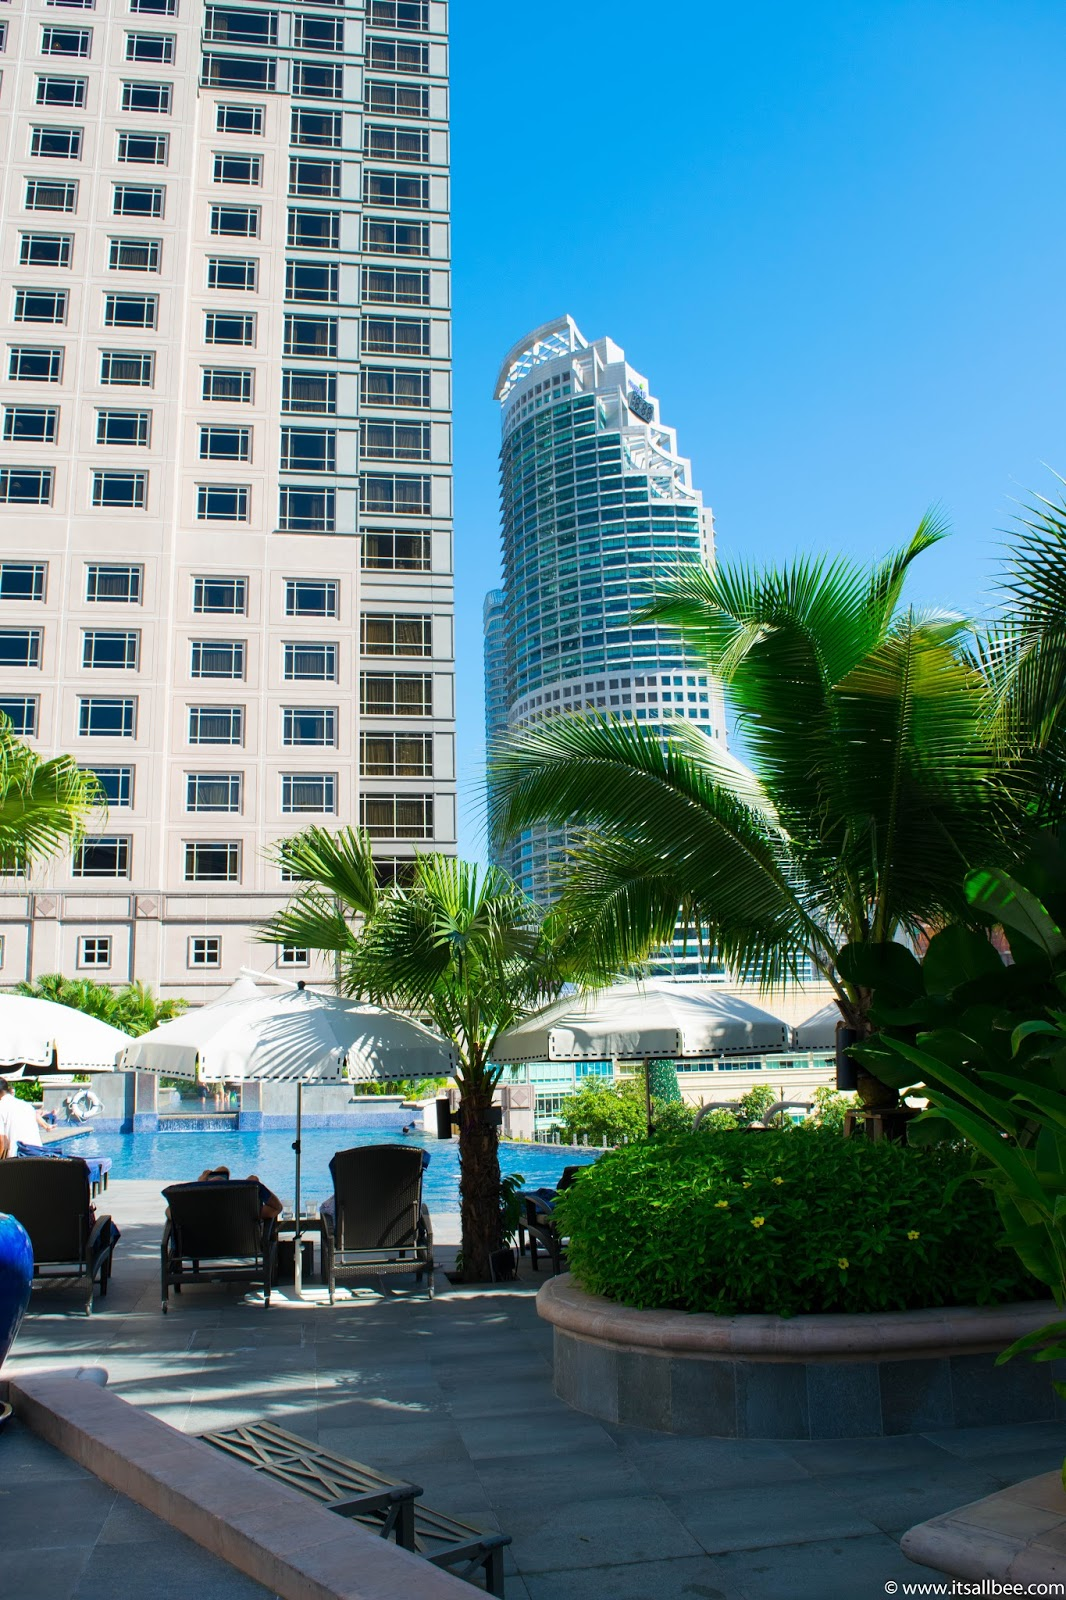 Mandarin Oriental Hotel Klcc Where To Stay In Kuala Lumpur